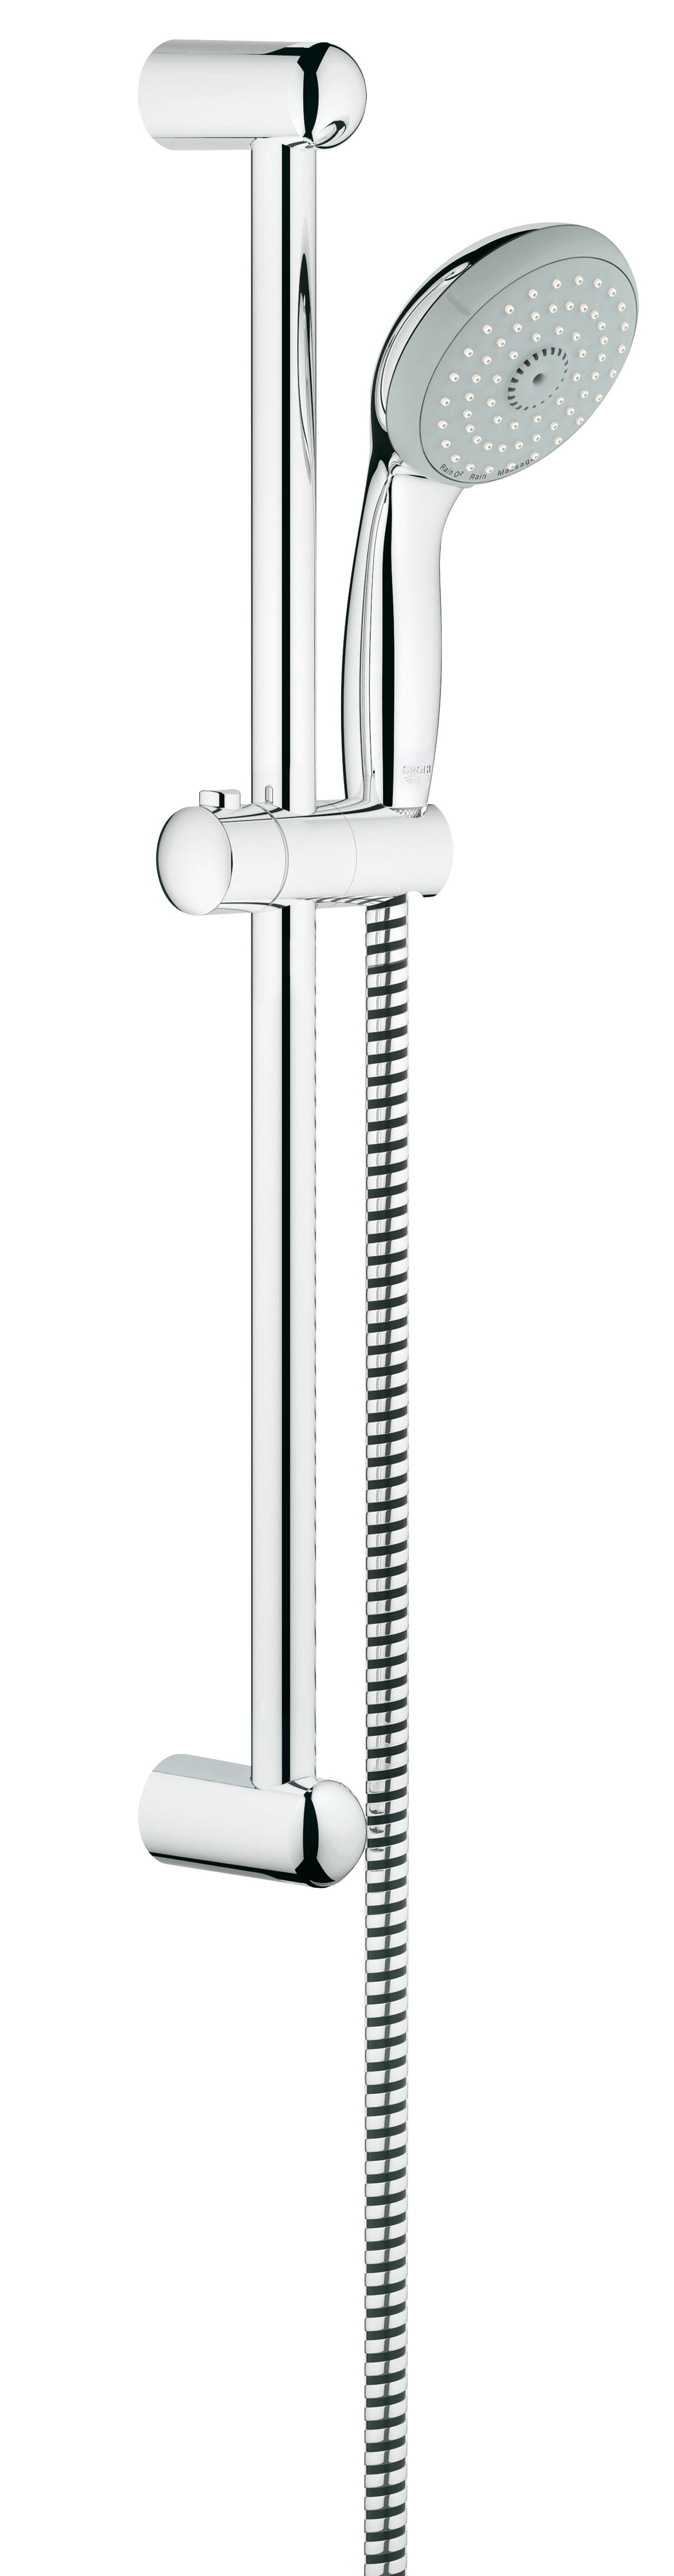 Душевой гарнитур Grohe 27794000 Tempesta Classic (ручной душ, штанга 600 мм, шланг 1750 мм), хром